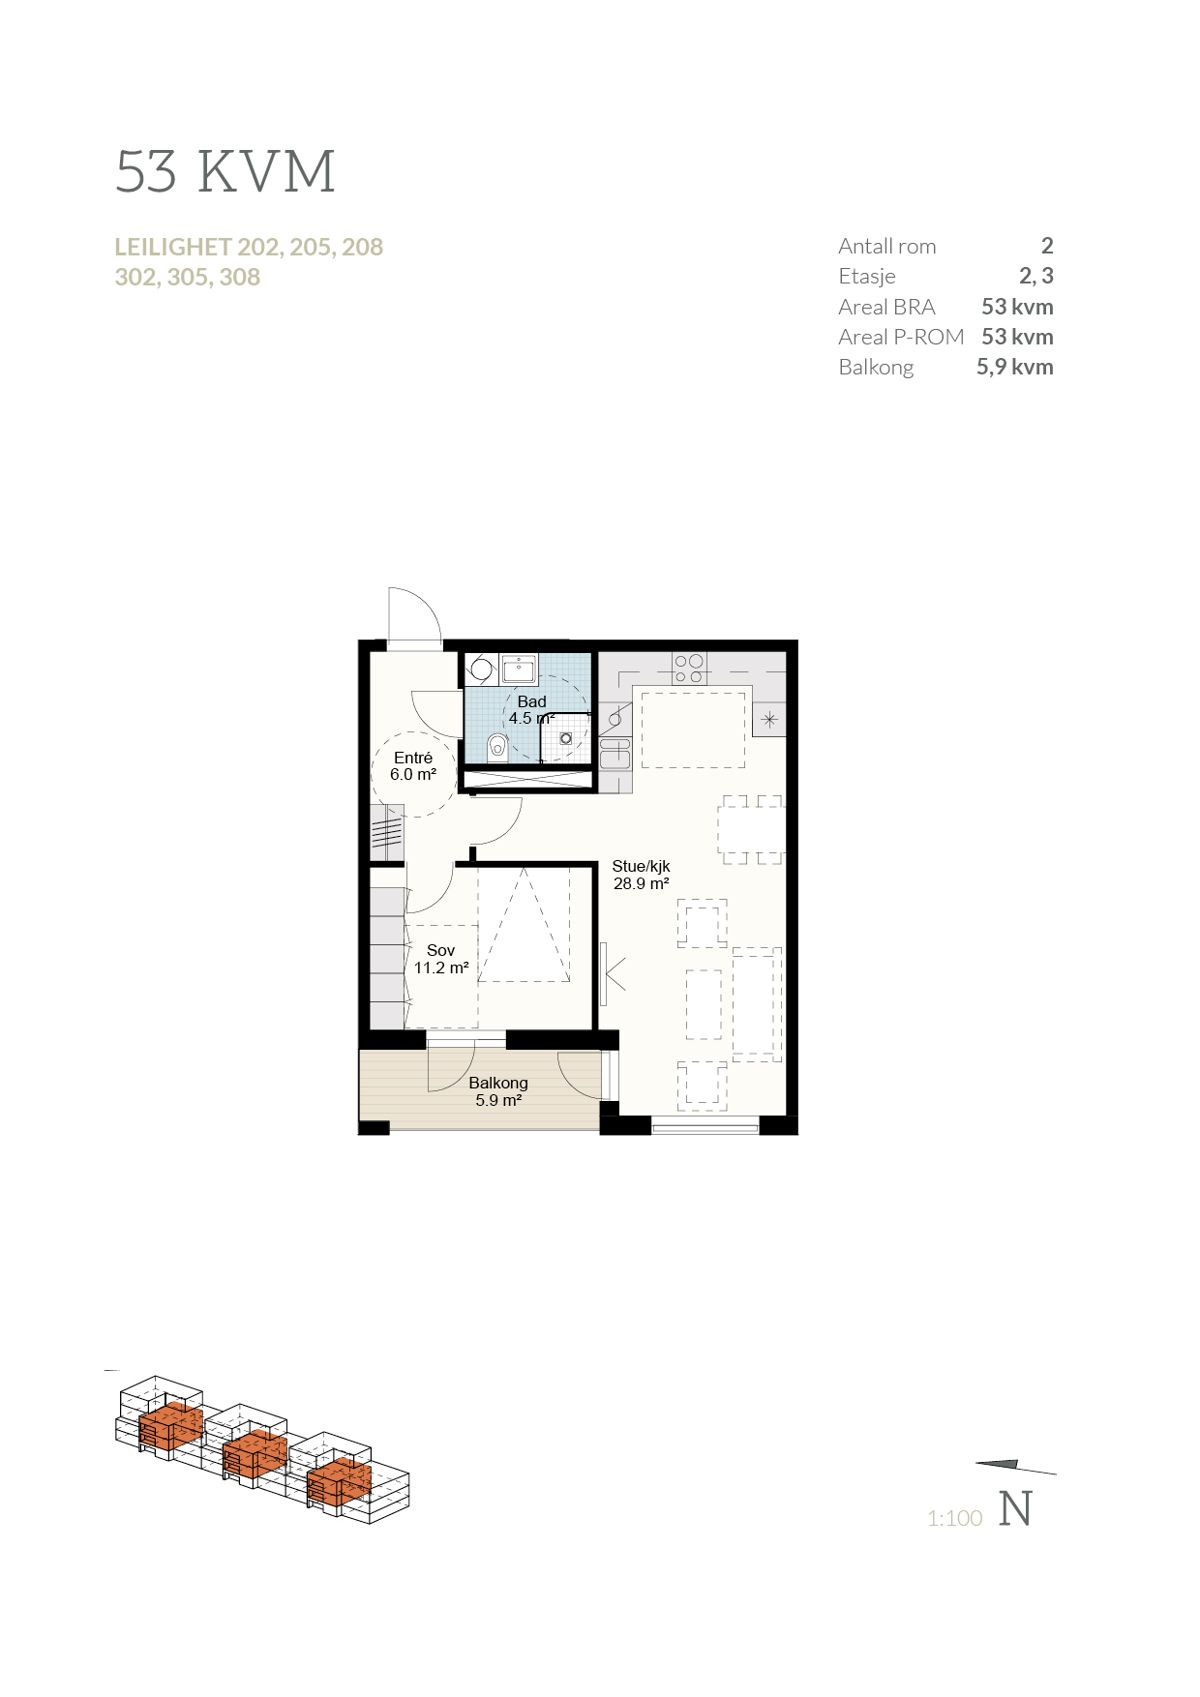 Brånåslunden Plantegning leilighet 205